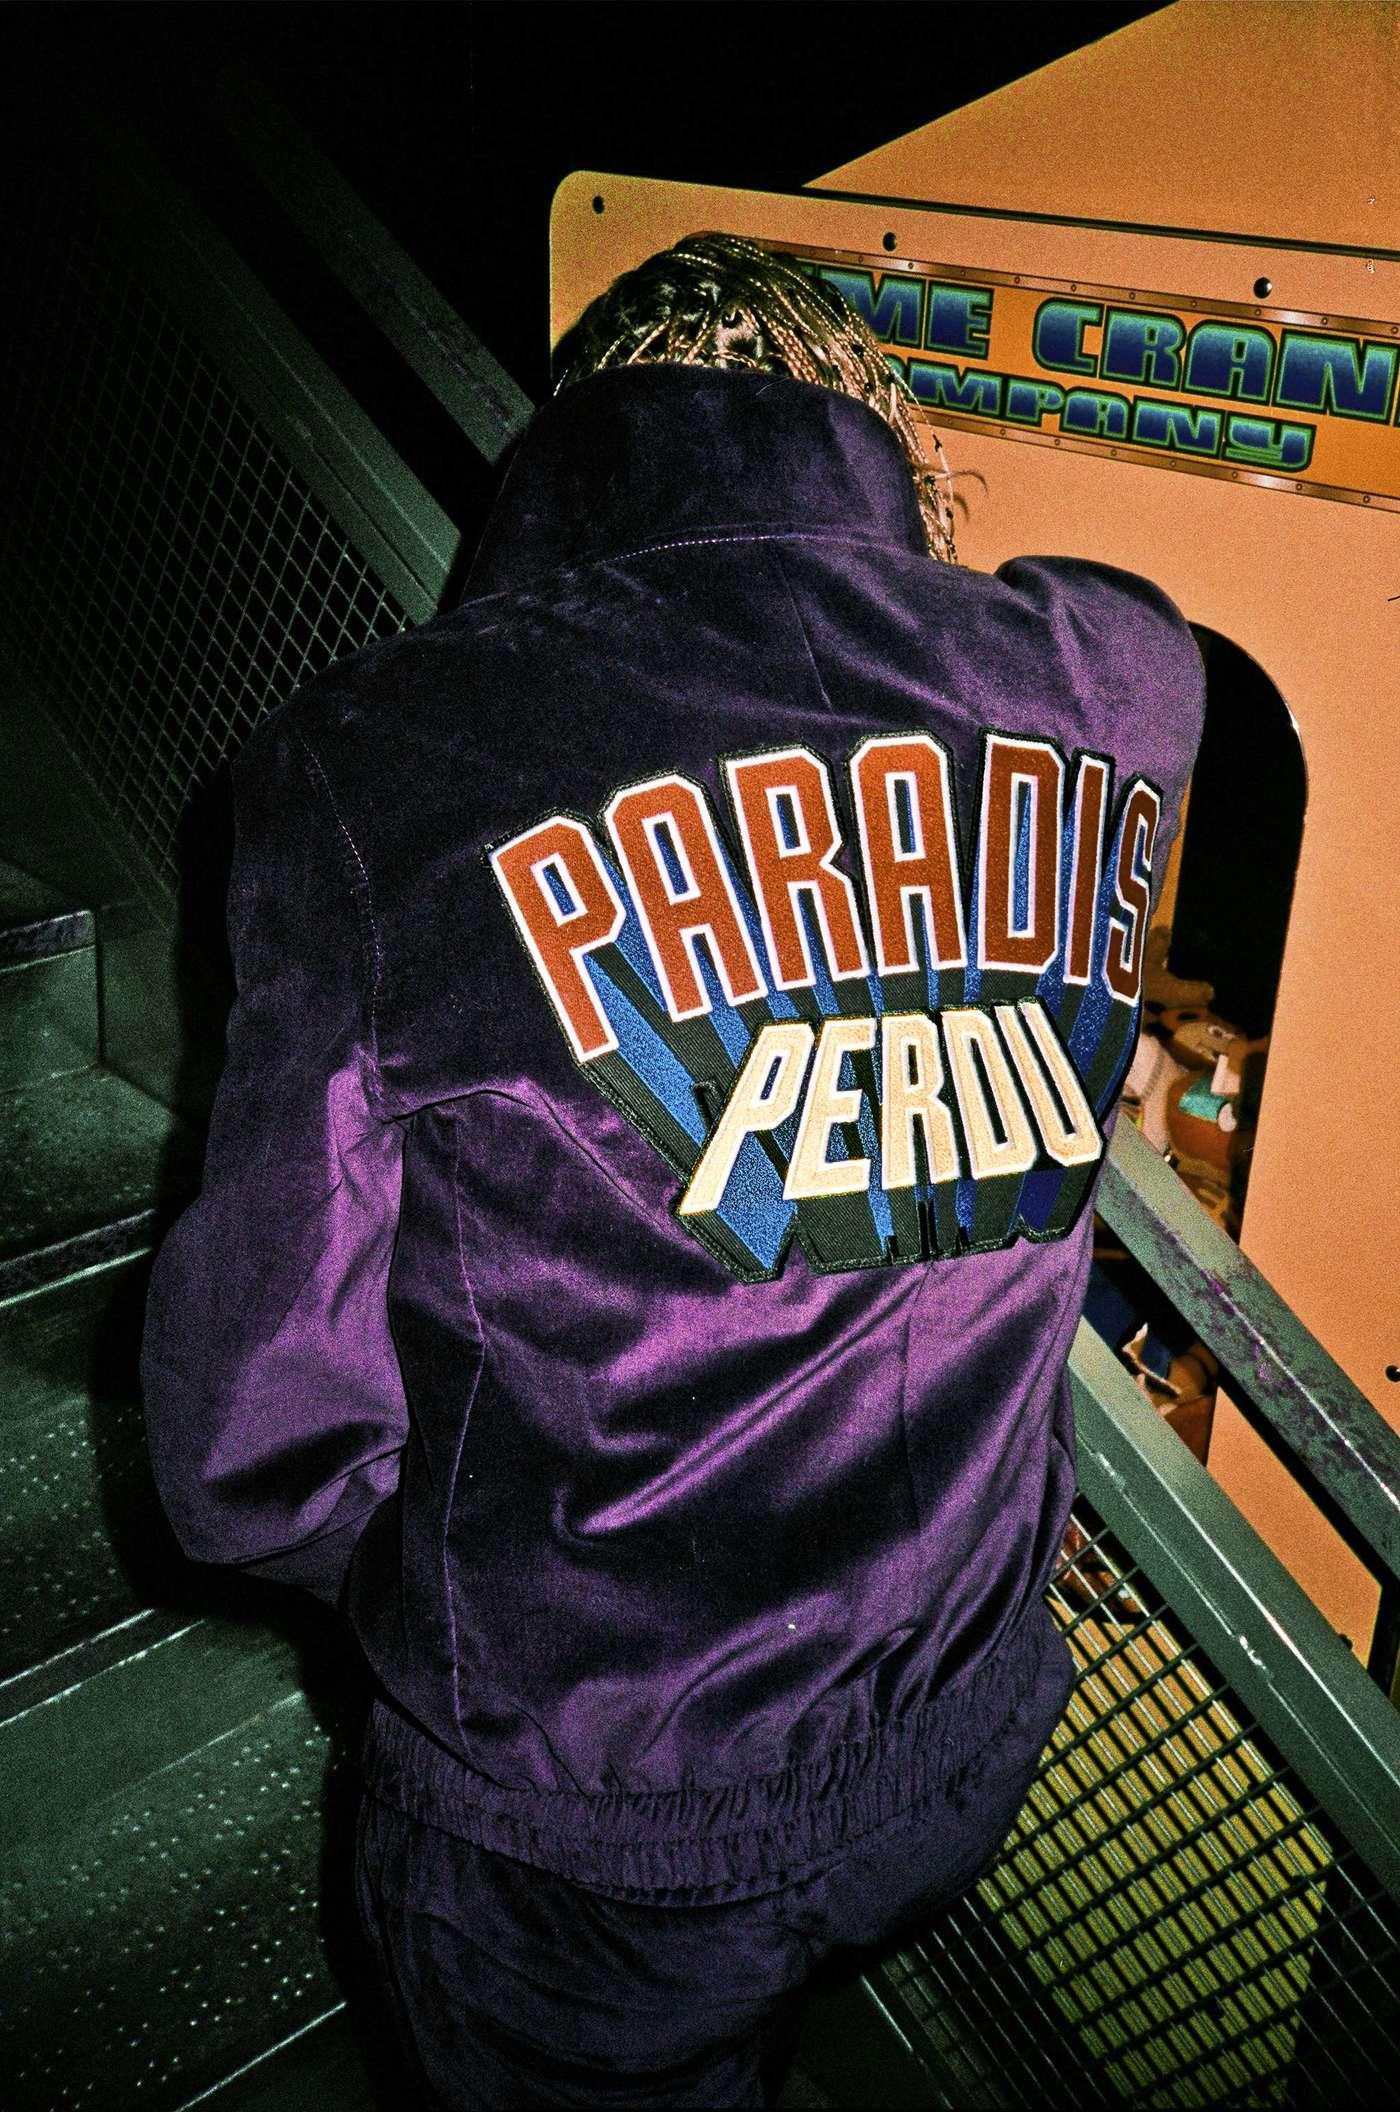 3.PARADIS' *PARADIS PERDU* Fall/Winter 2017 Collection